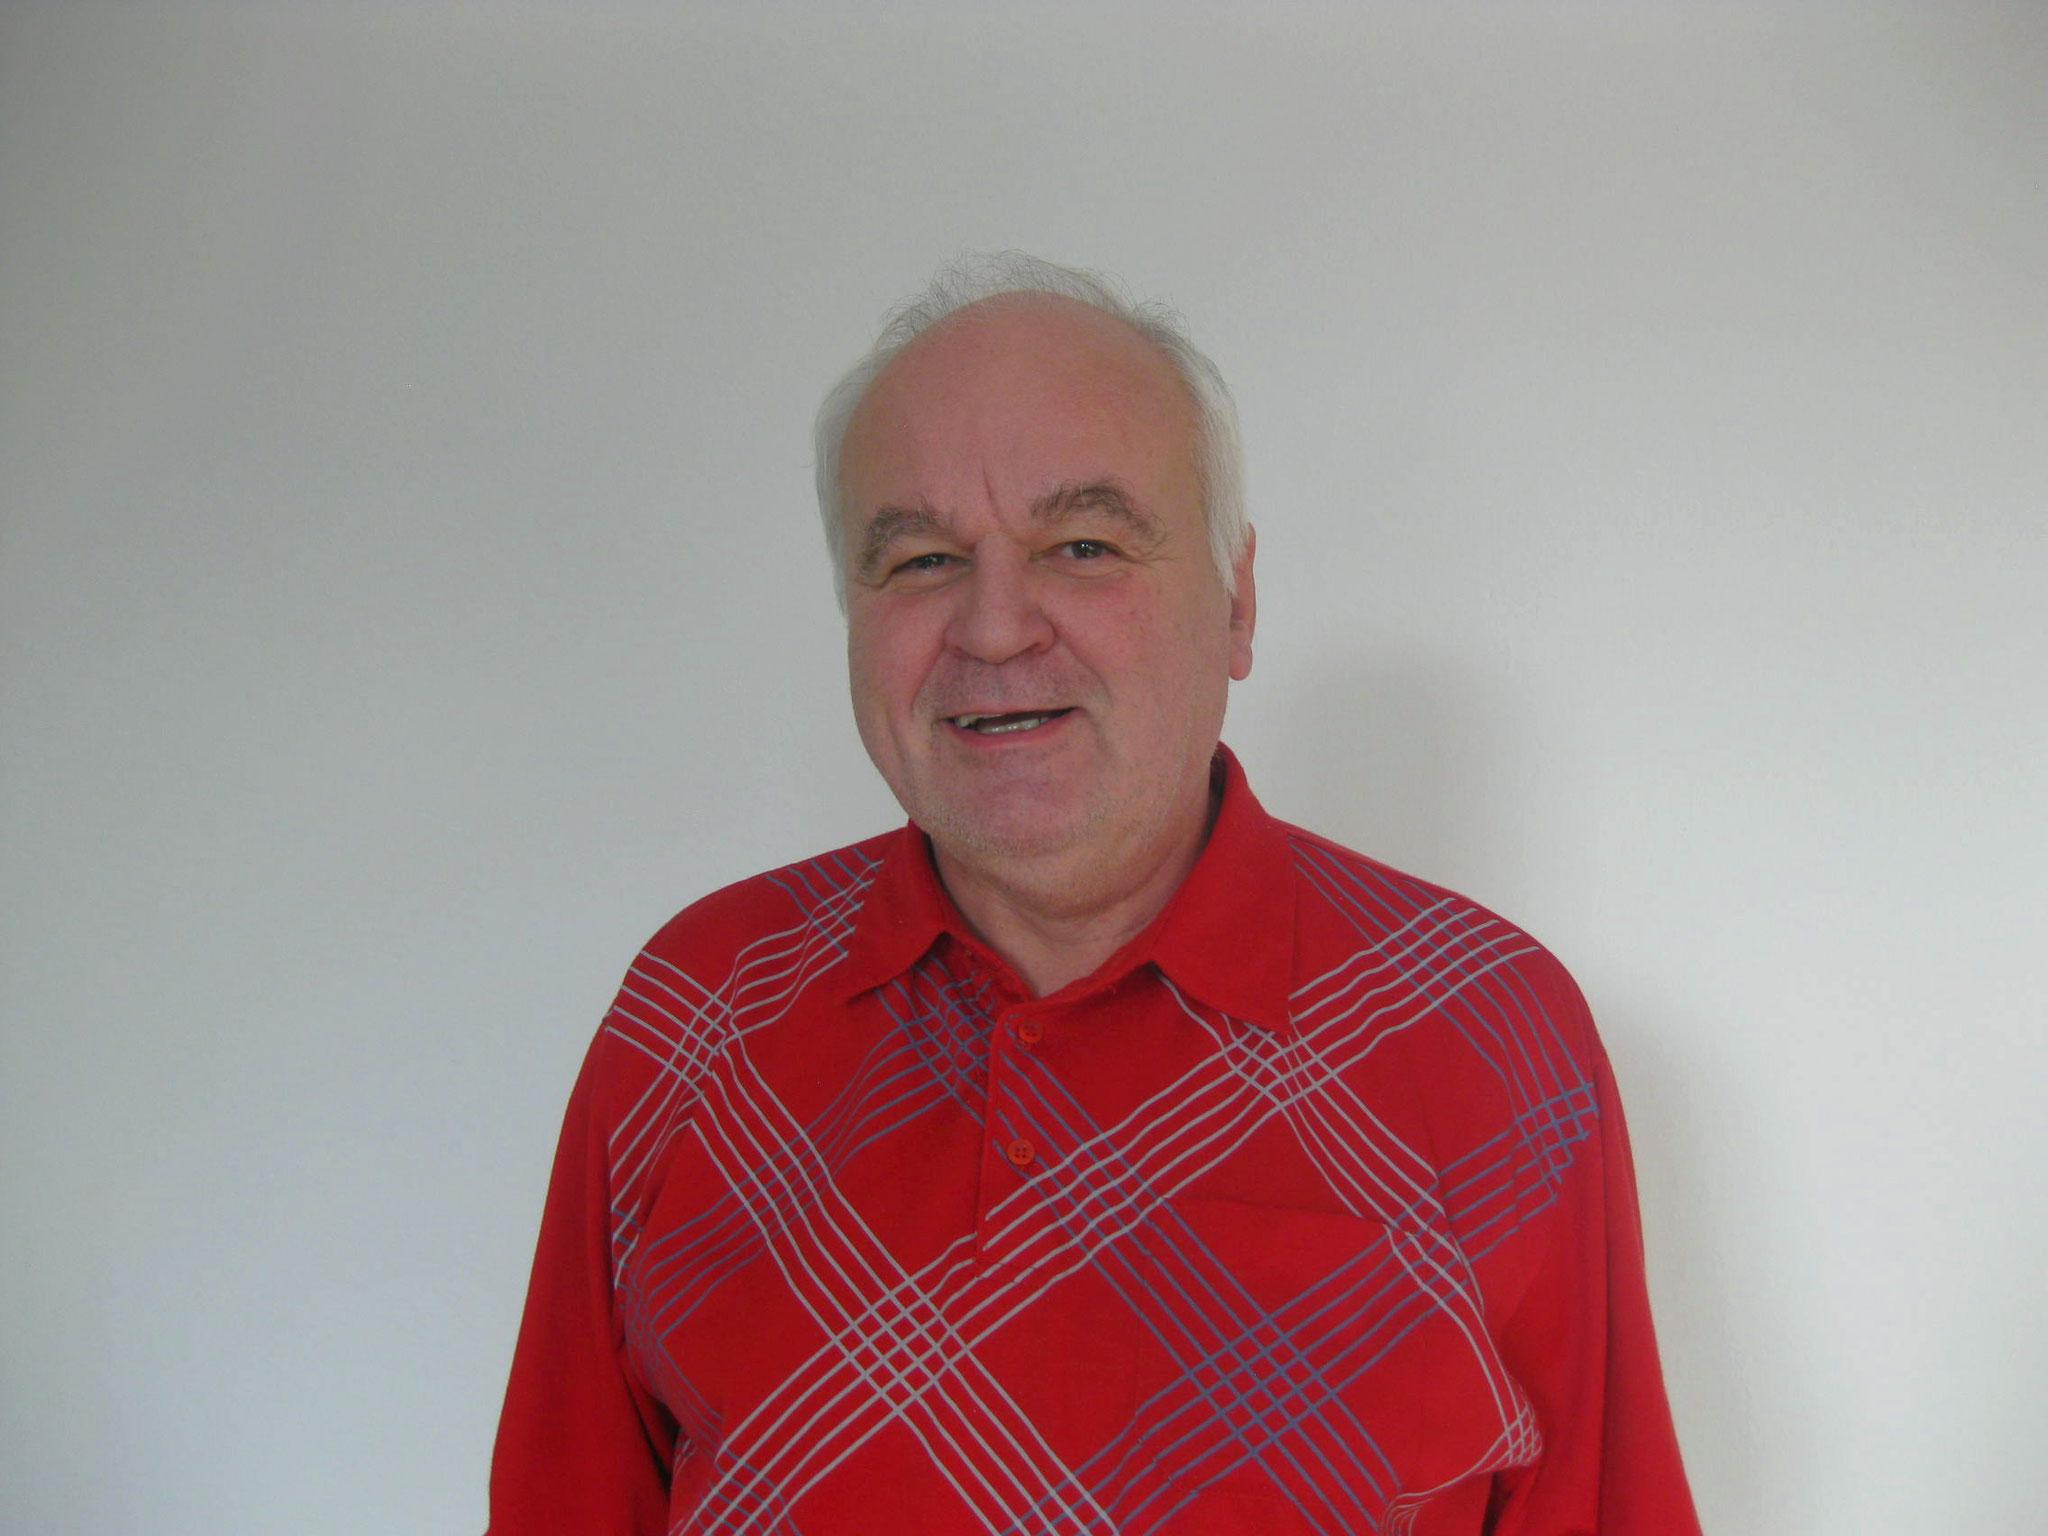 Paul Beyer <br> Erster Vorsitzender